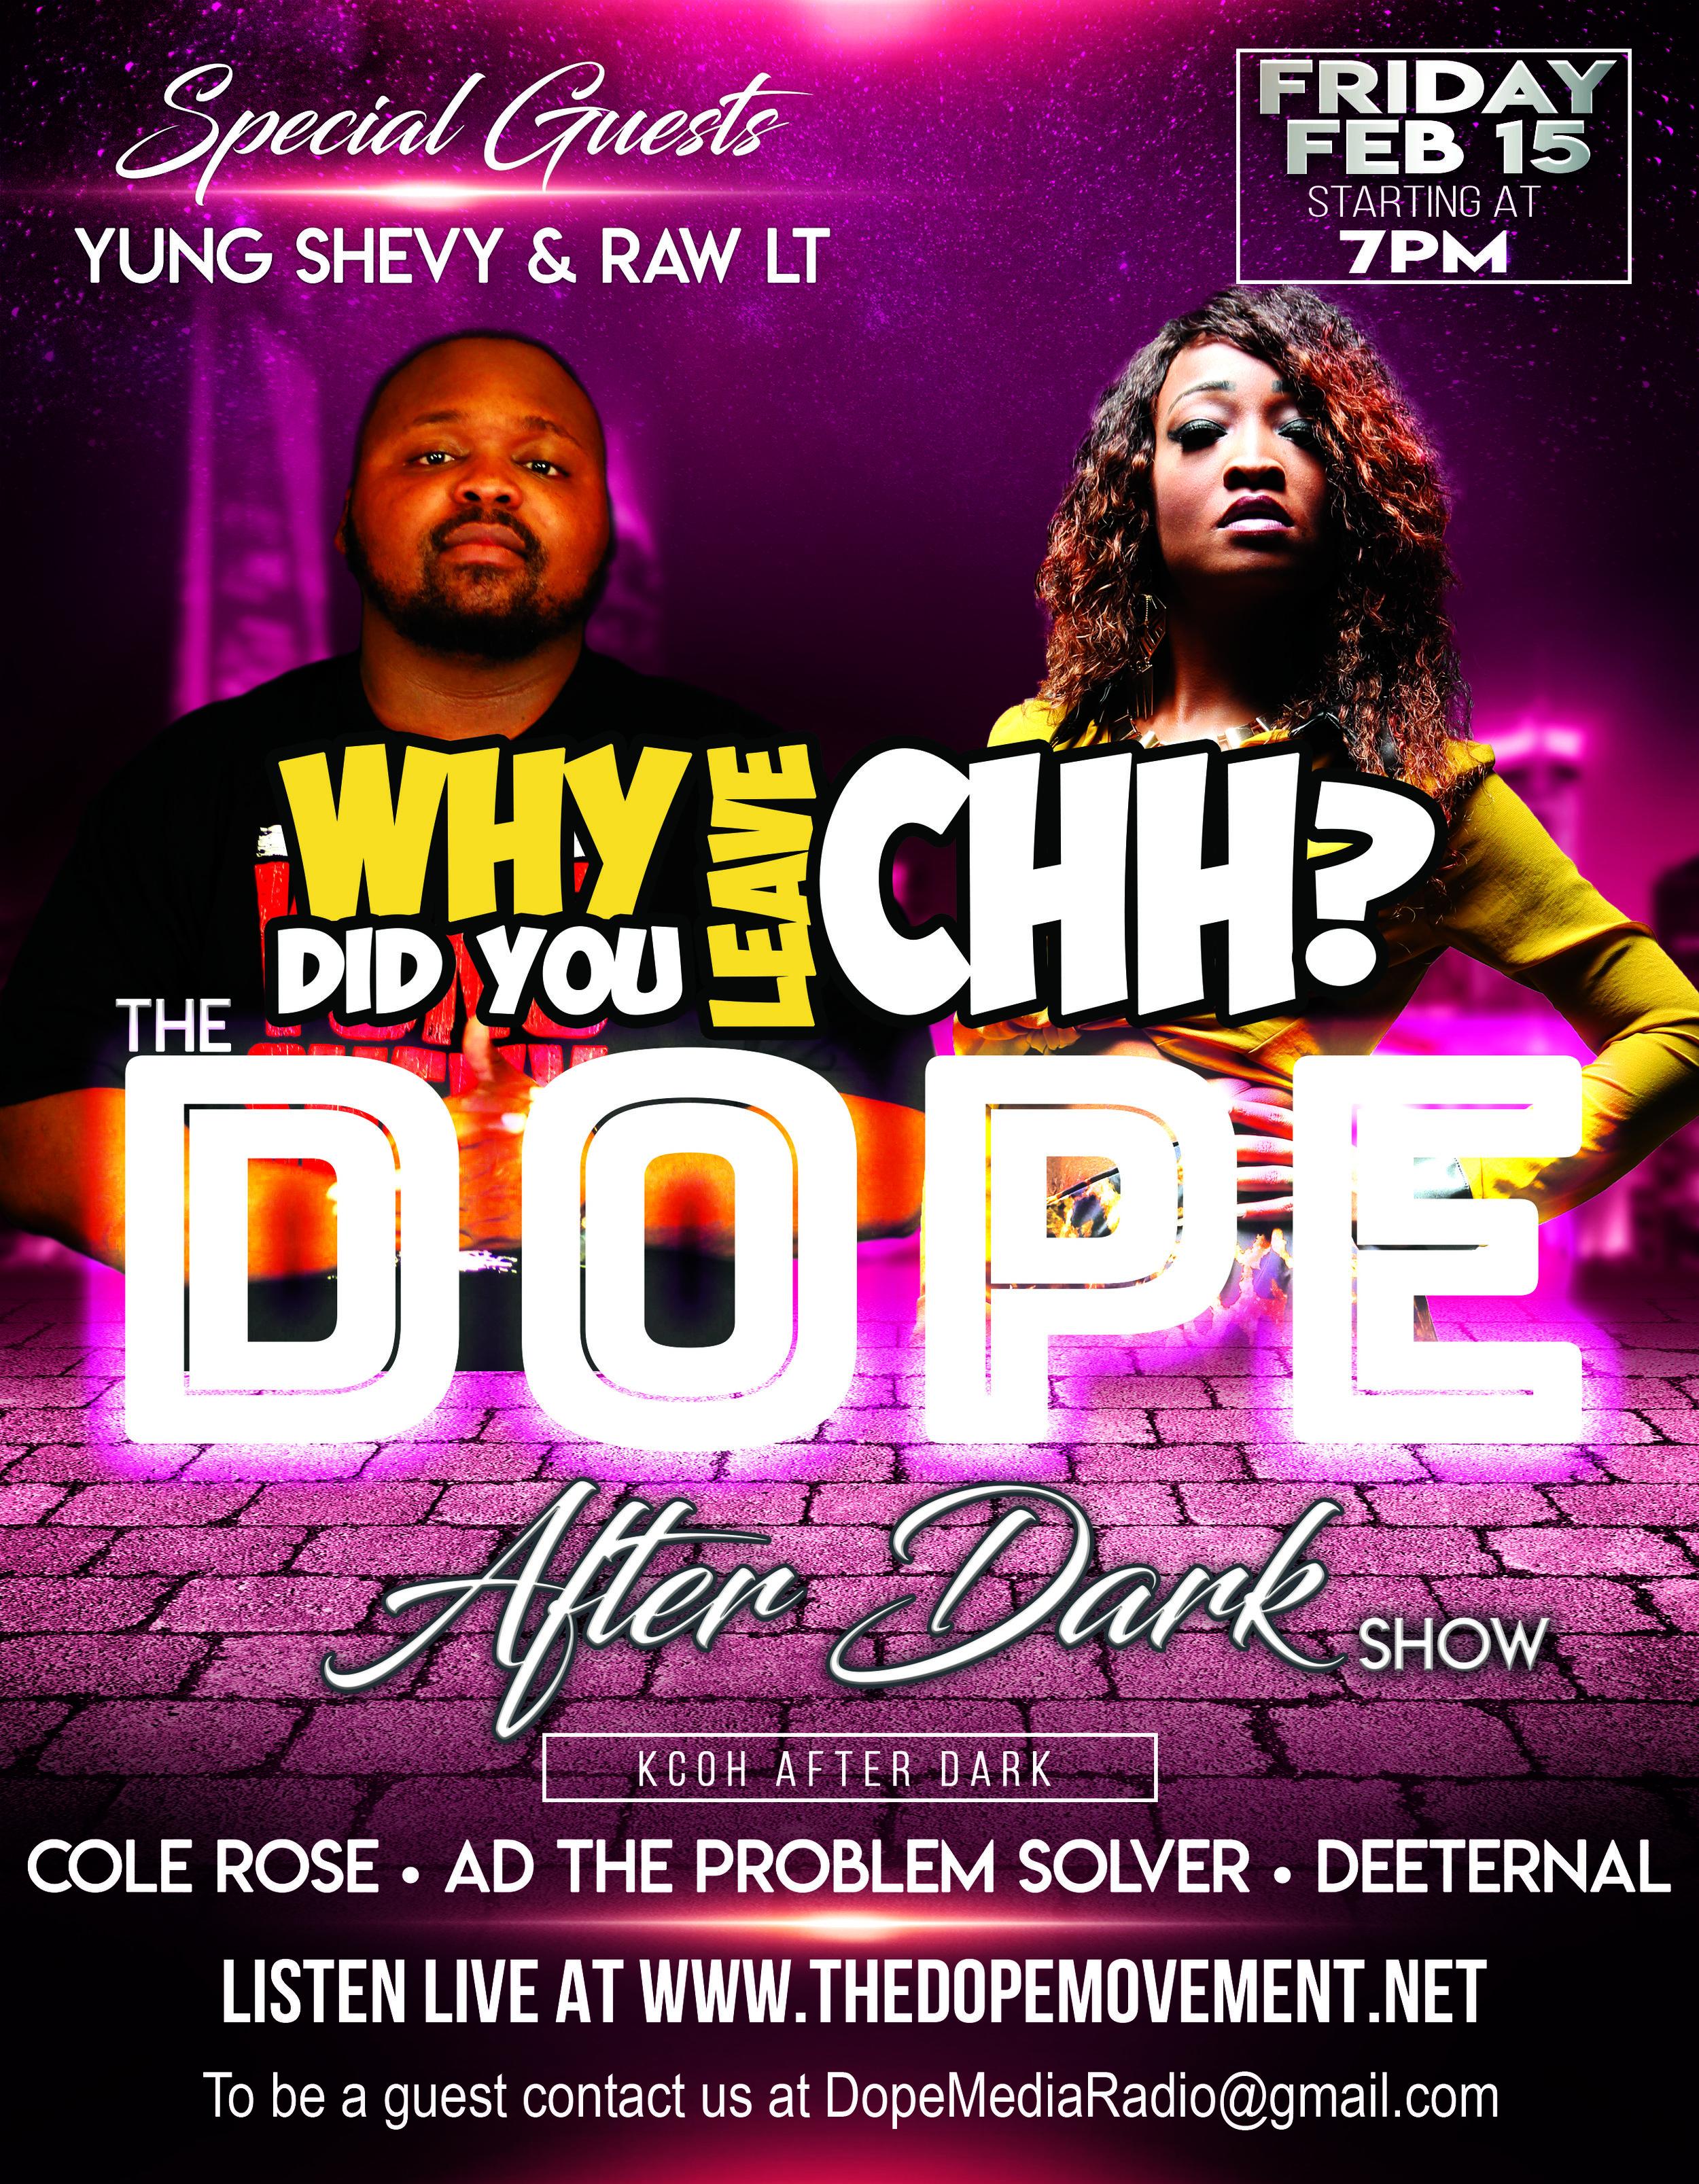 DOPE After Dark Yung Shevy Raw LT.jpg